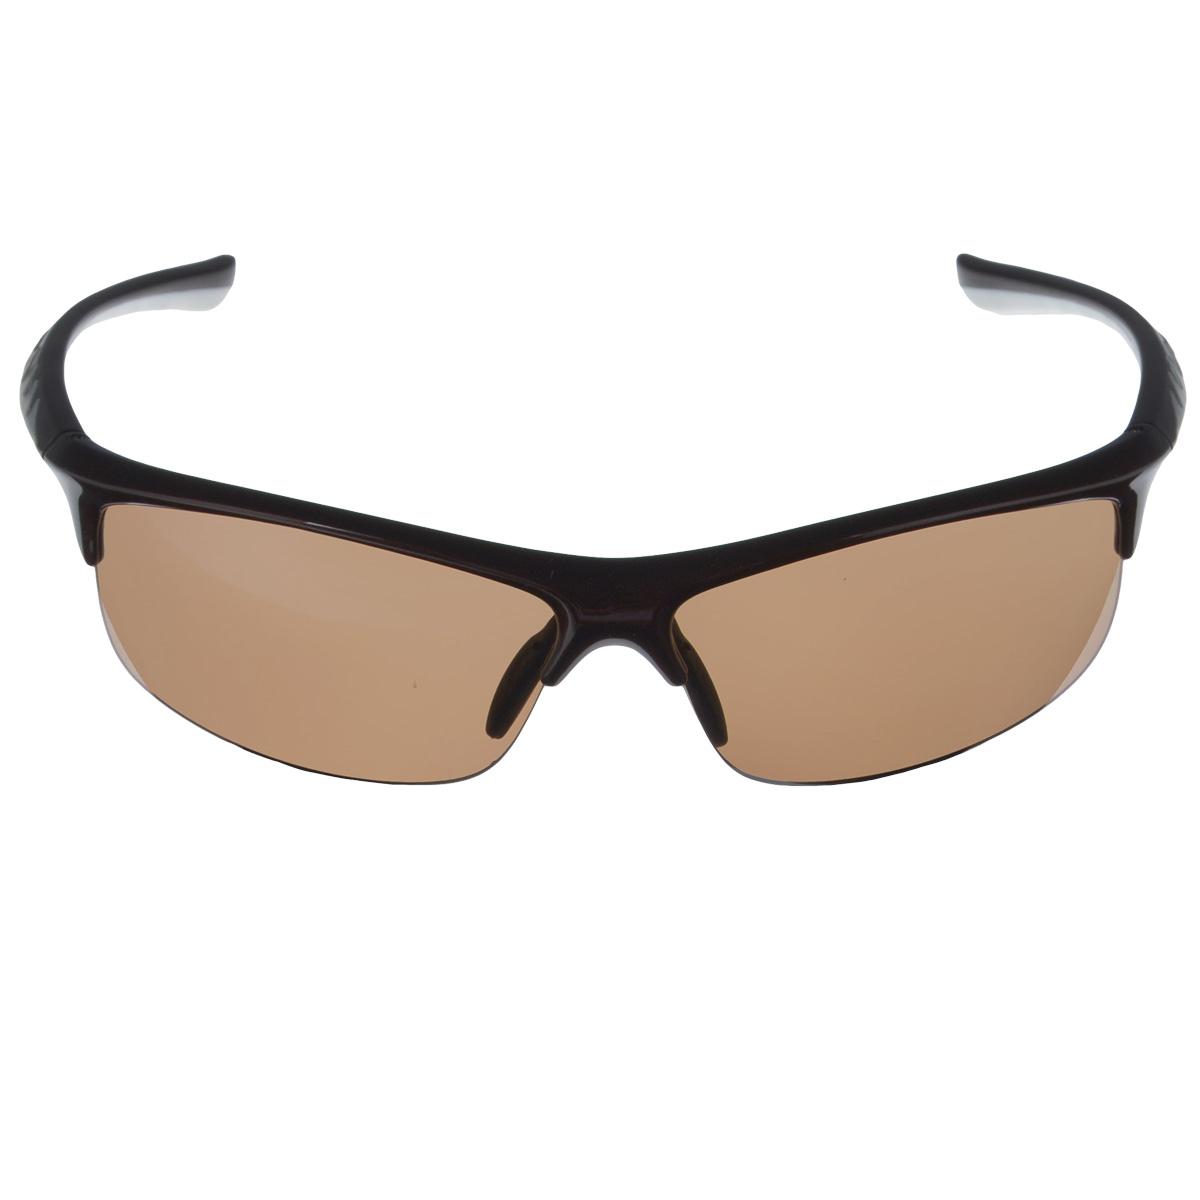 SP Glasses AS021 Premium, Chocolate White водительские очки темные